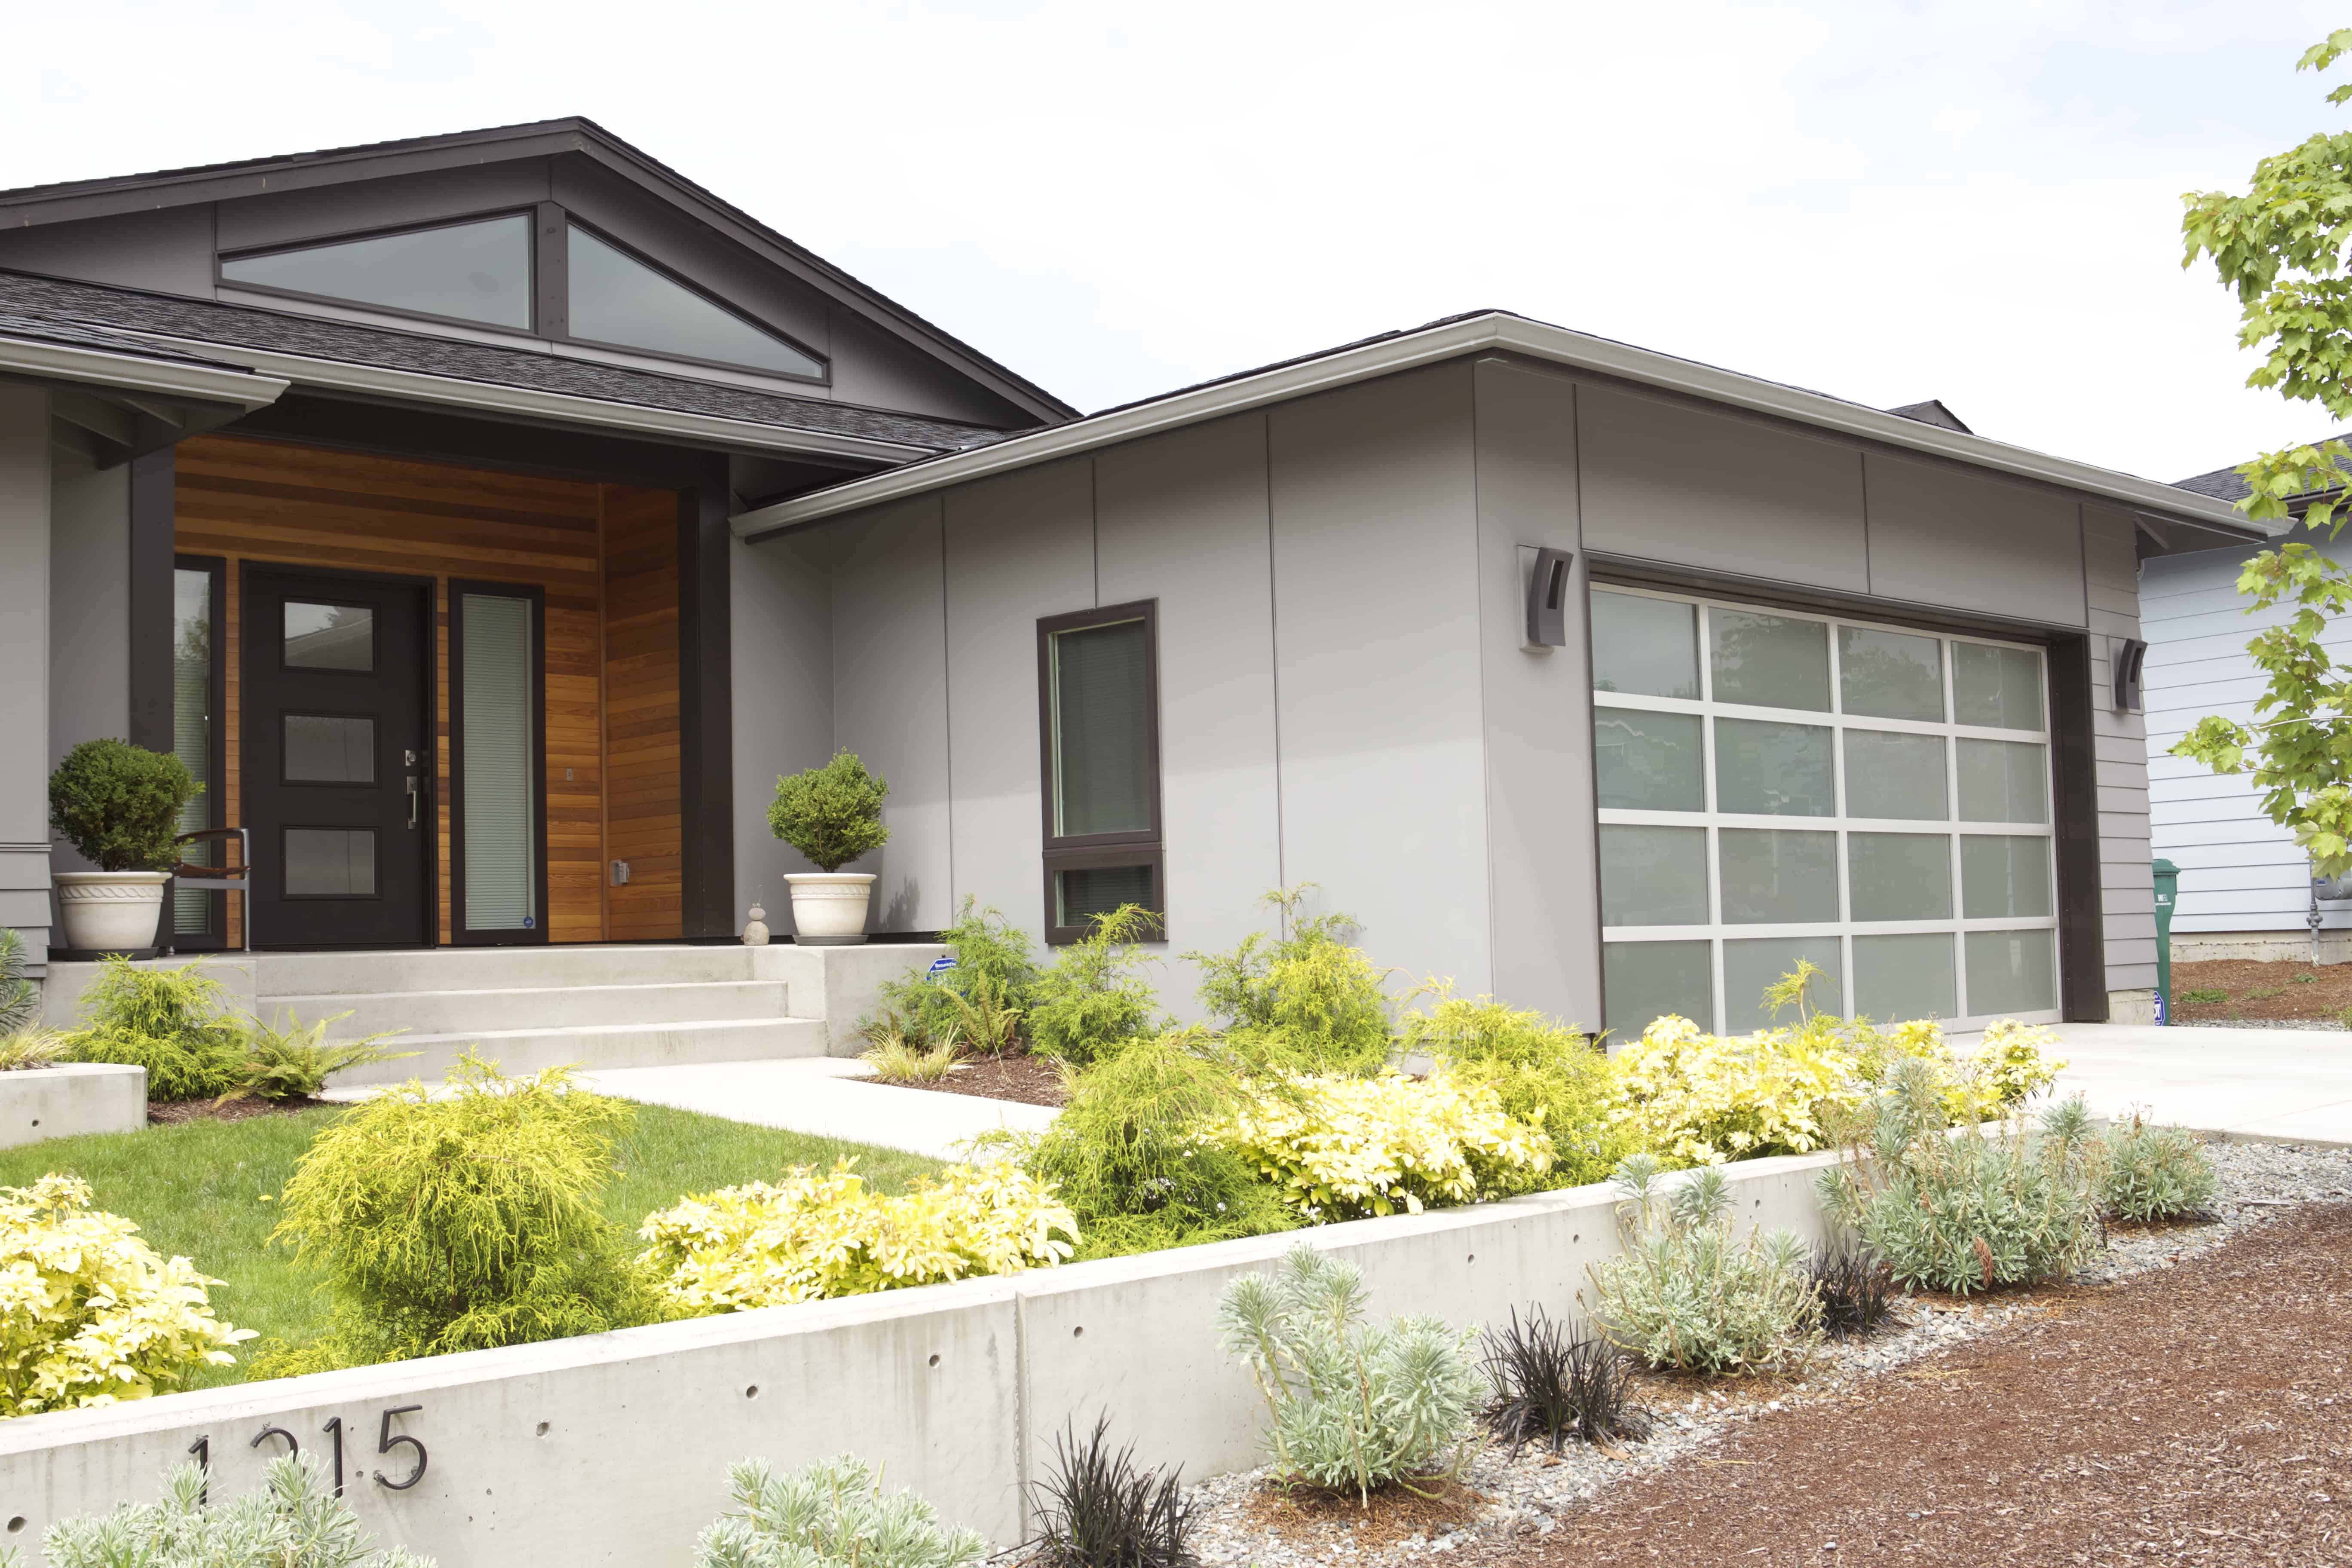 wayne dalton unveils a new online tool garage door design center wayne dalton unveils a new online tool garage door design center cressy door fireplace